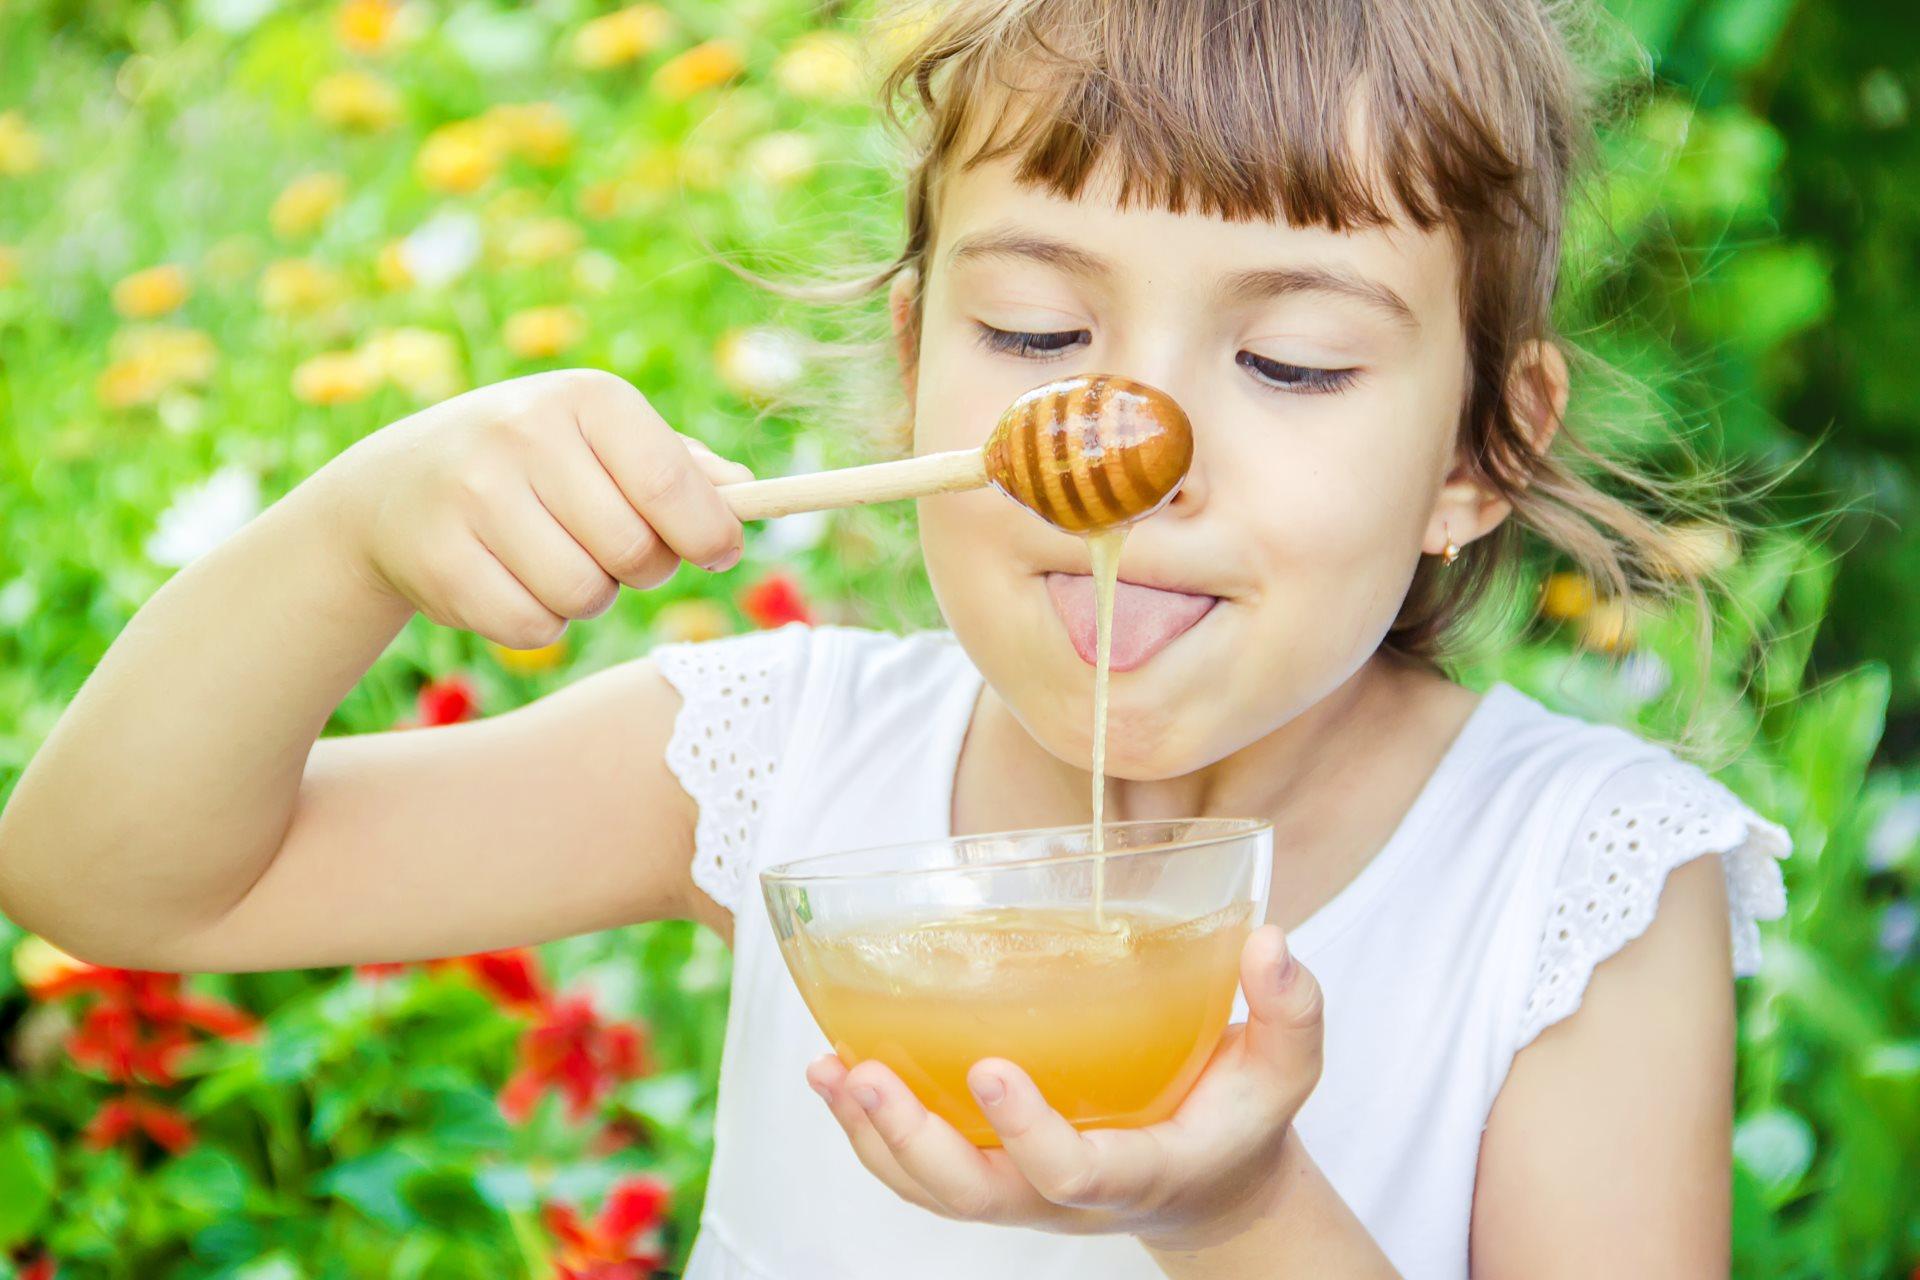 danas deci namazite obraze medom_1131309974